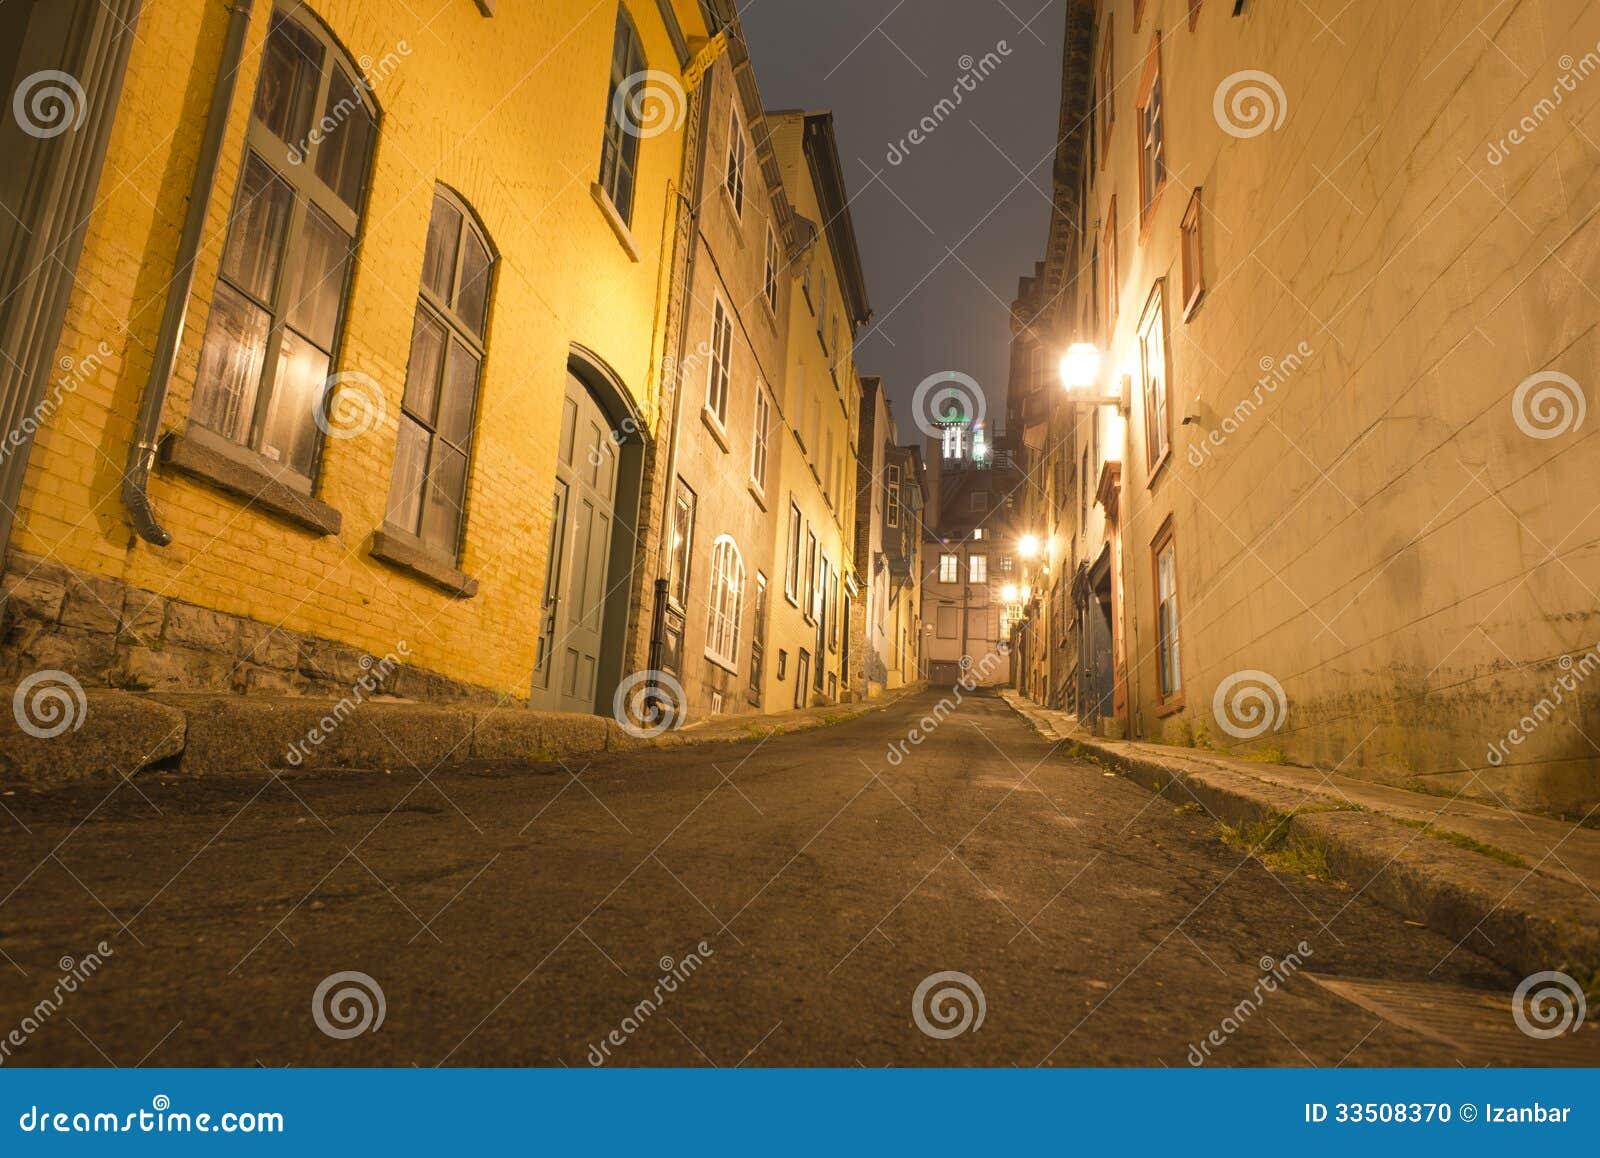 Quebec city night view